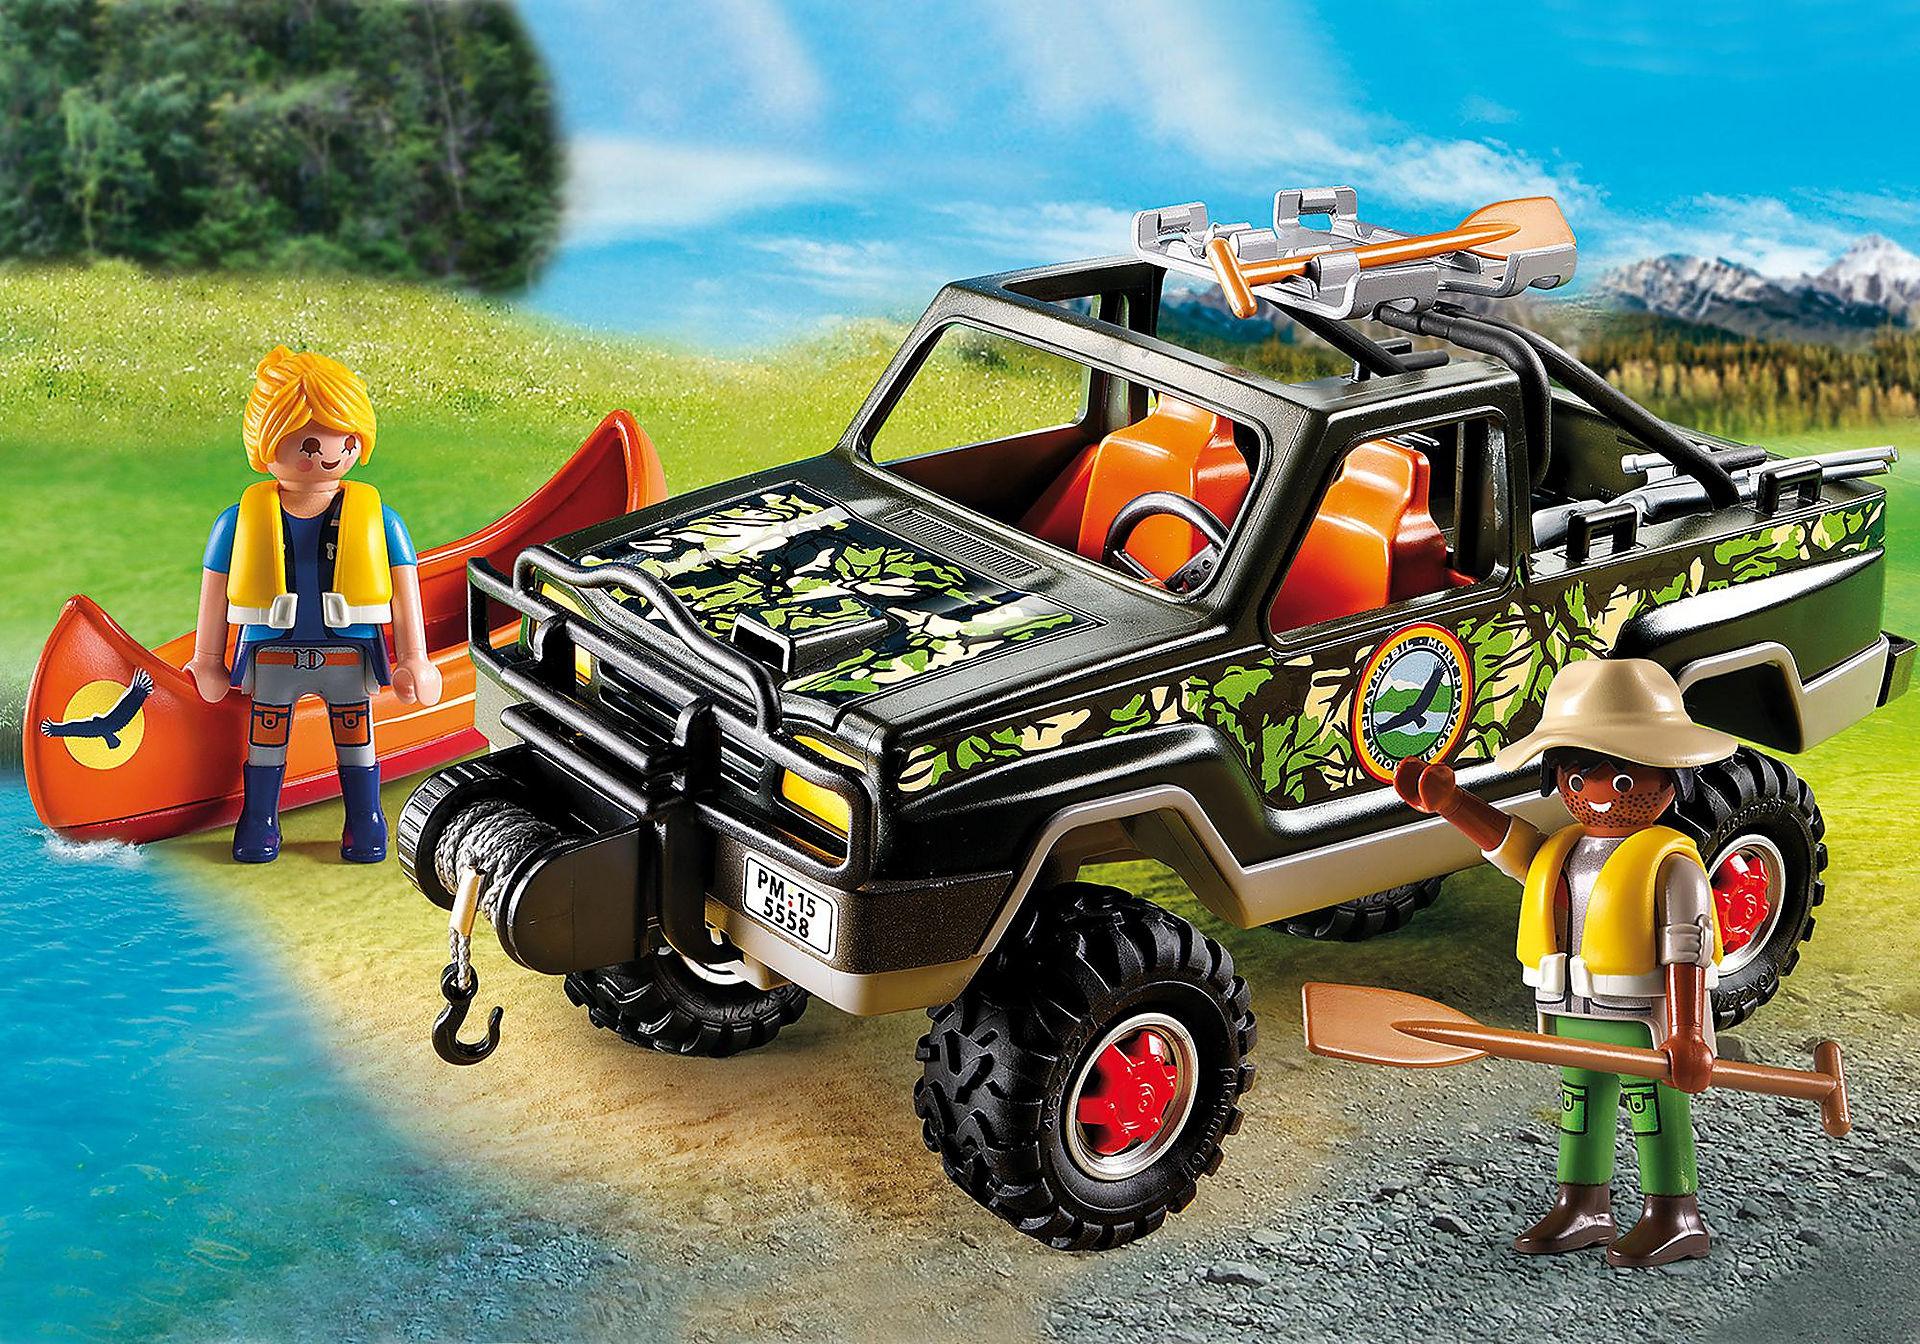 http://media.playmobil.com/i/playmobil/5558_product_detail/Adventure Pickup Truck